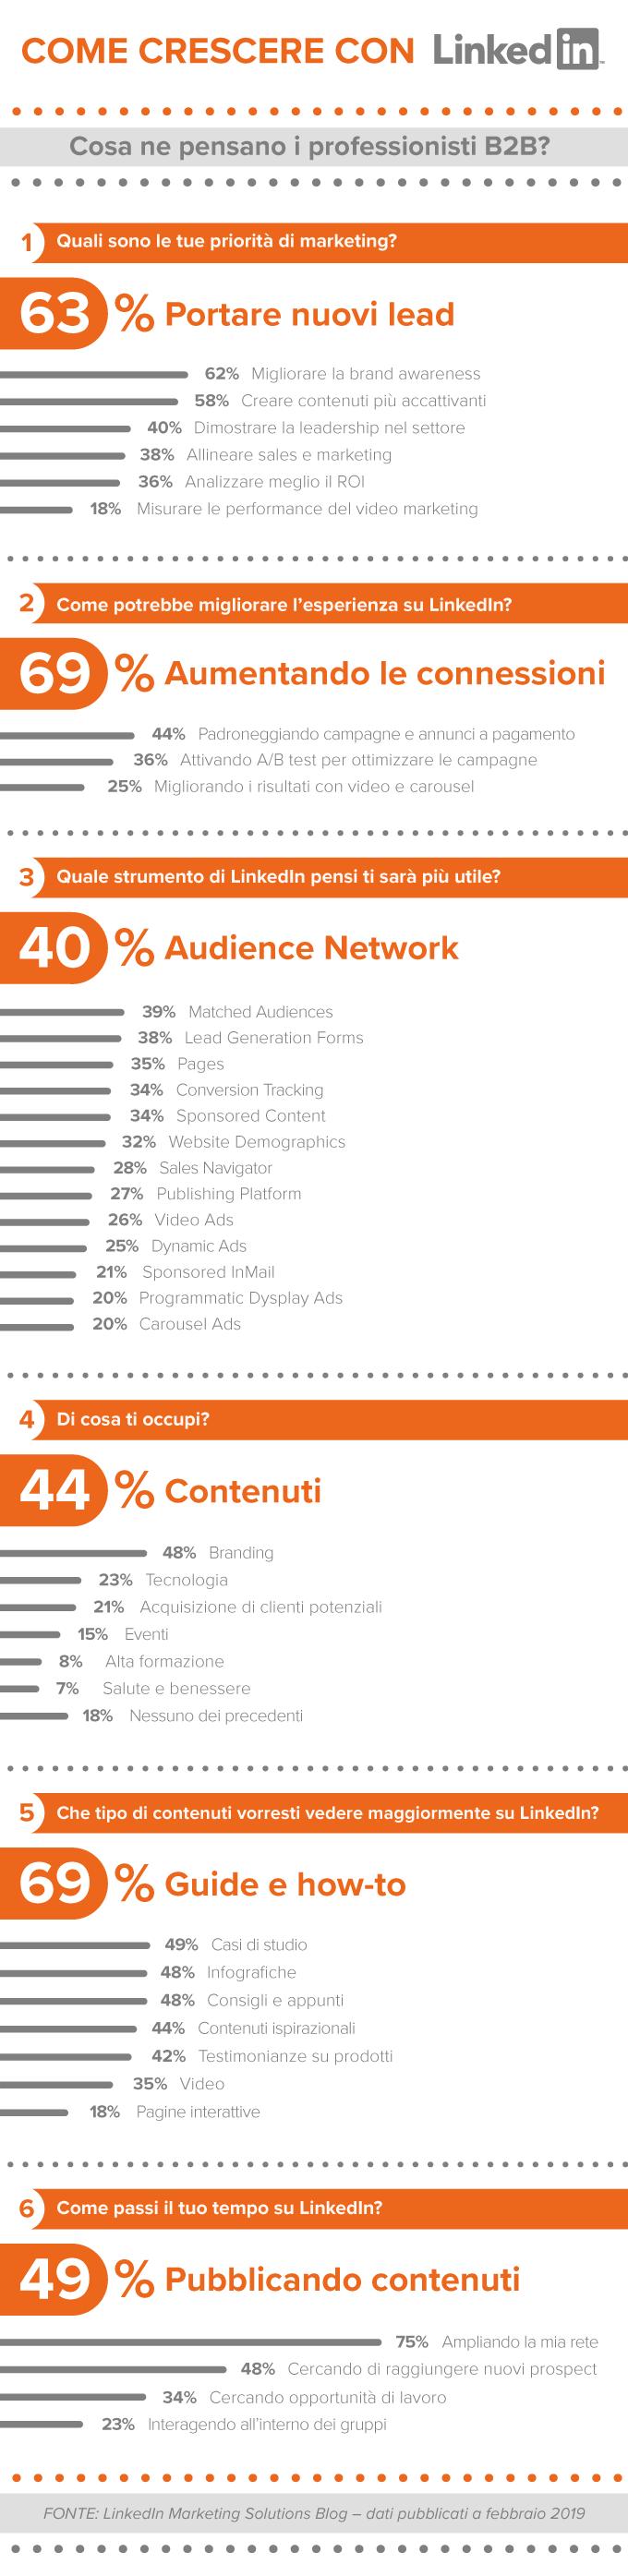 strategie di marketing b2b - infografica Linkedin